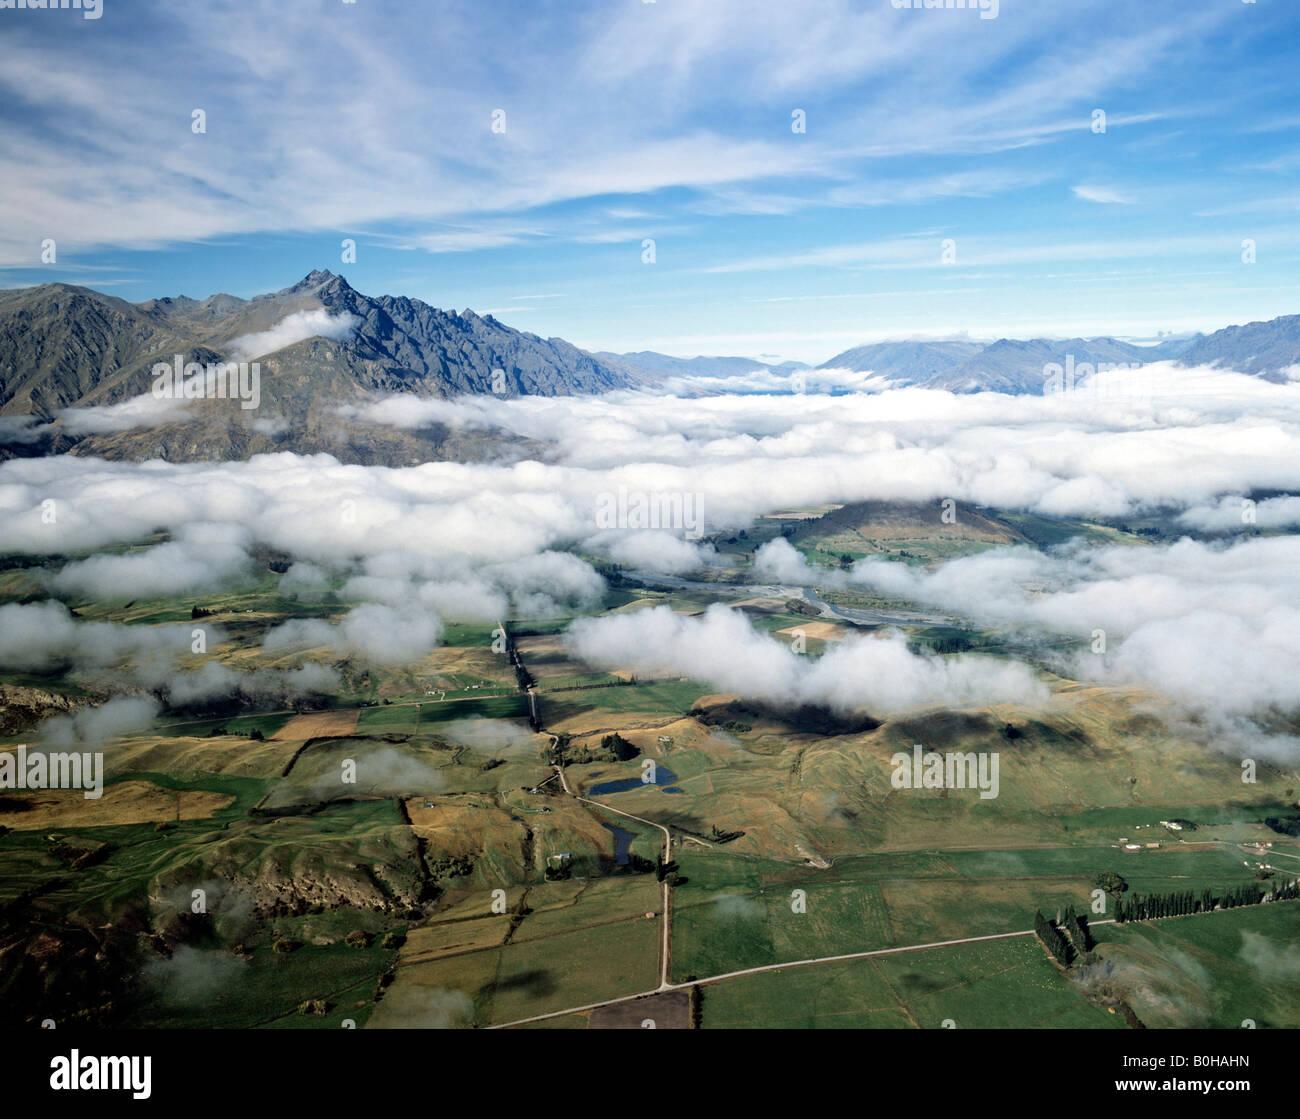 Landscape around Lake Wakatipu, Queenstown, South Island, New Zealand - Stock Image